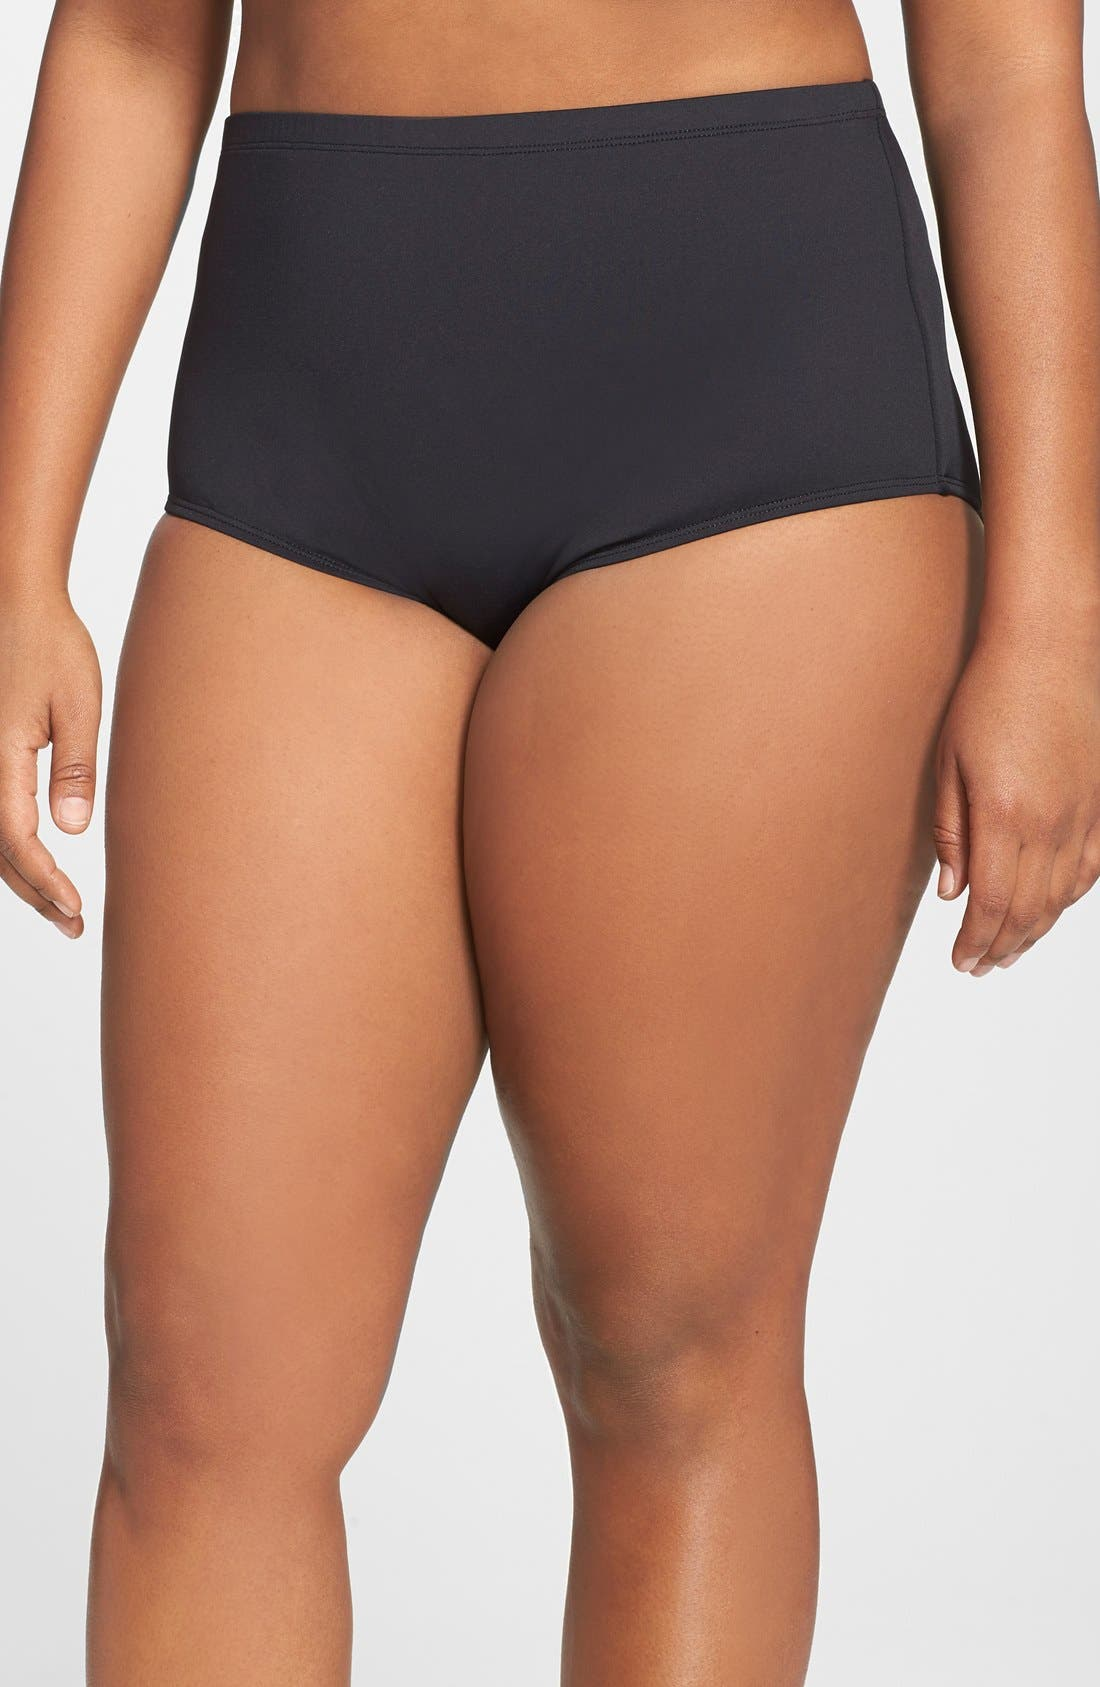 Alternate Image 1 Selected - La Blanca High Waist Bikini Bottoms (Plus Size)